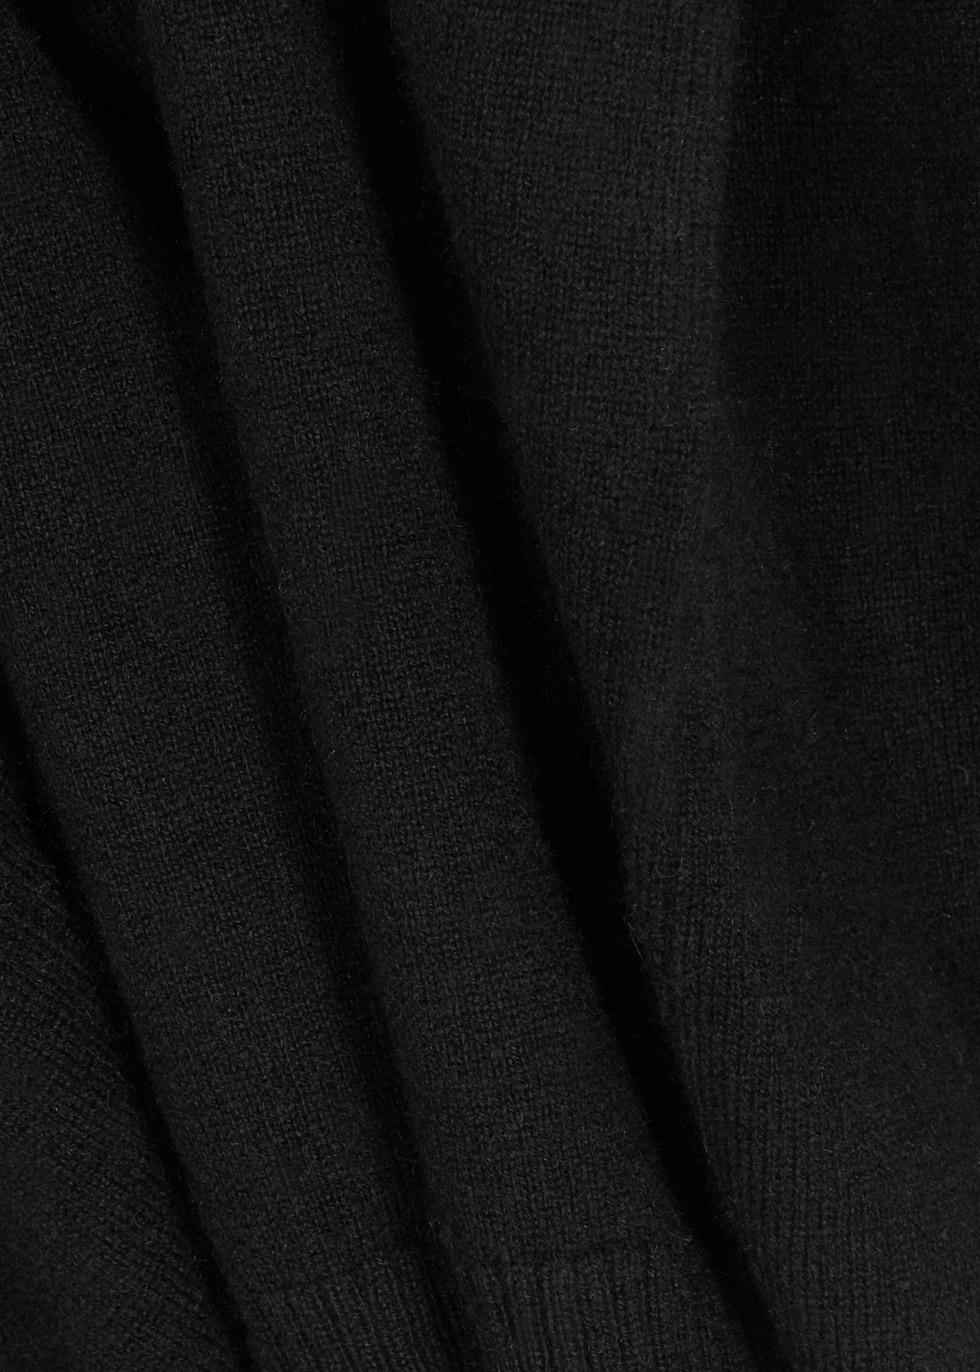 Vail black cashmere jumper - Le Kasha